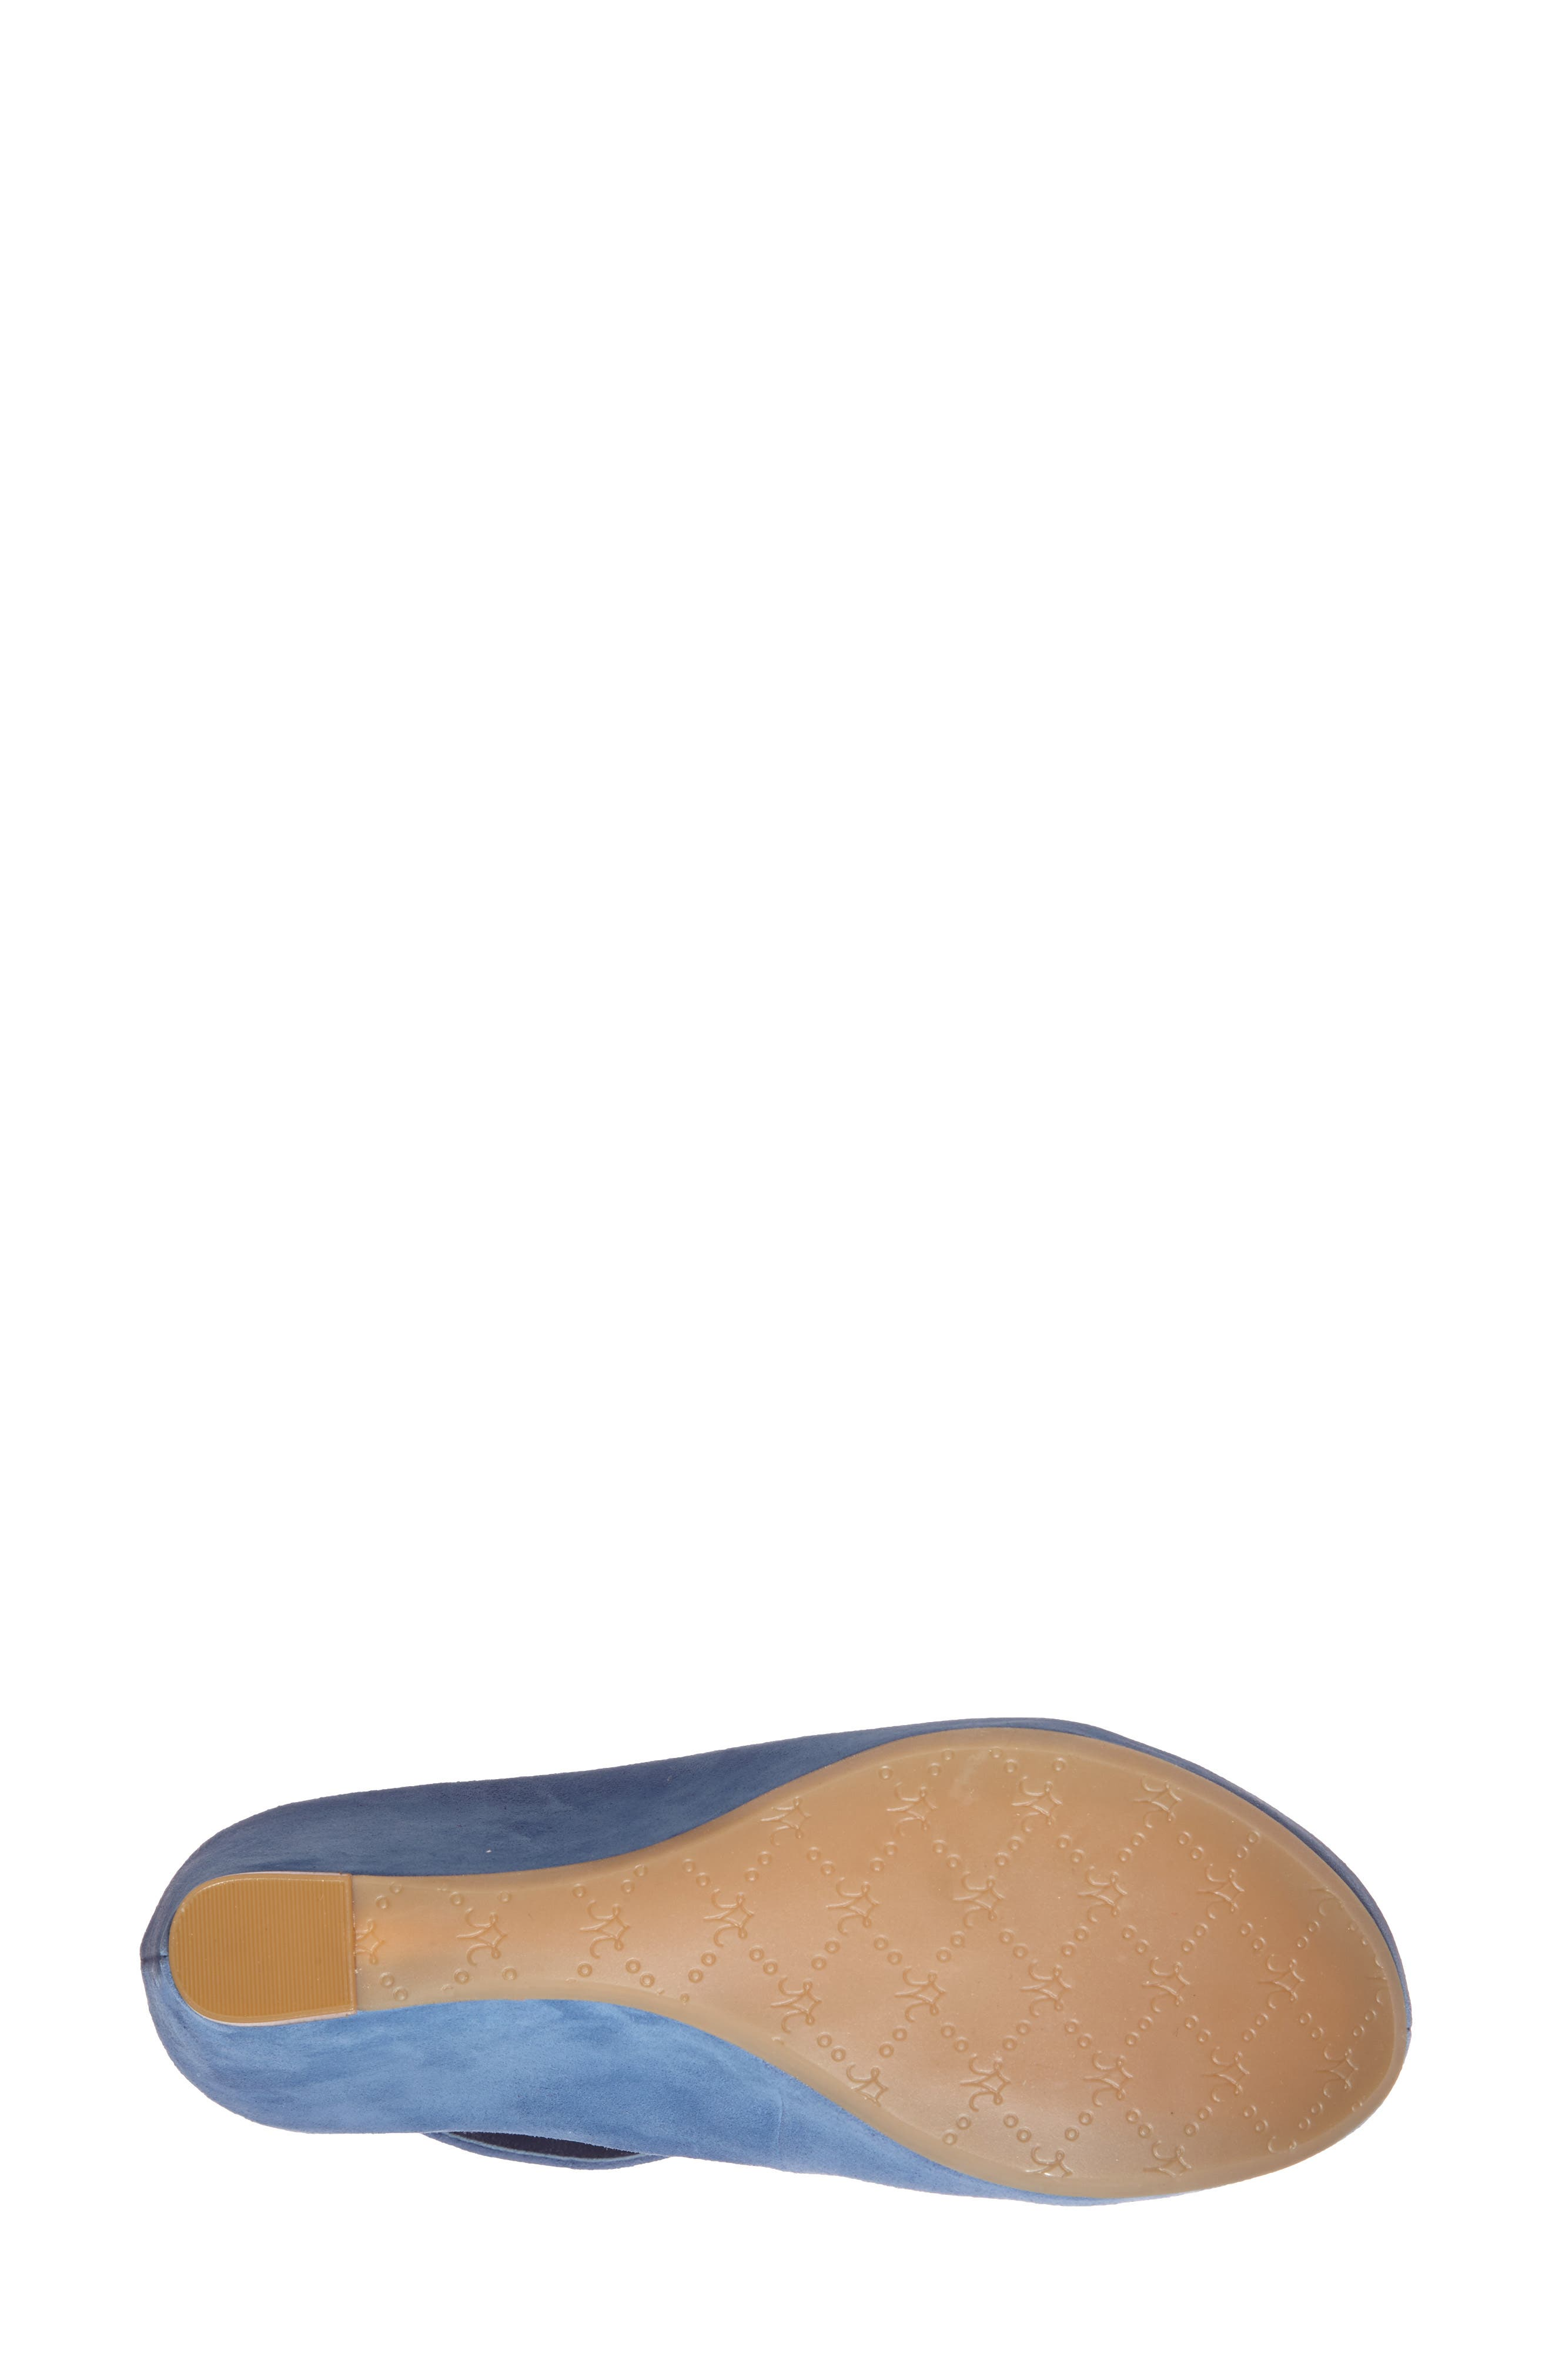 'Tricia' Ankle Strap Sandal,                             Alternate thumbnail 17, color,